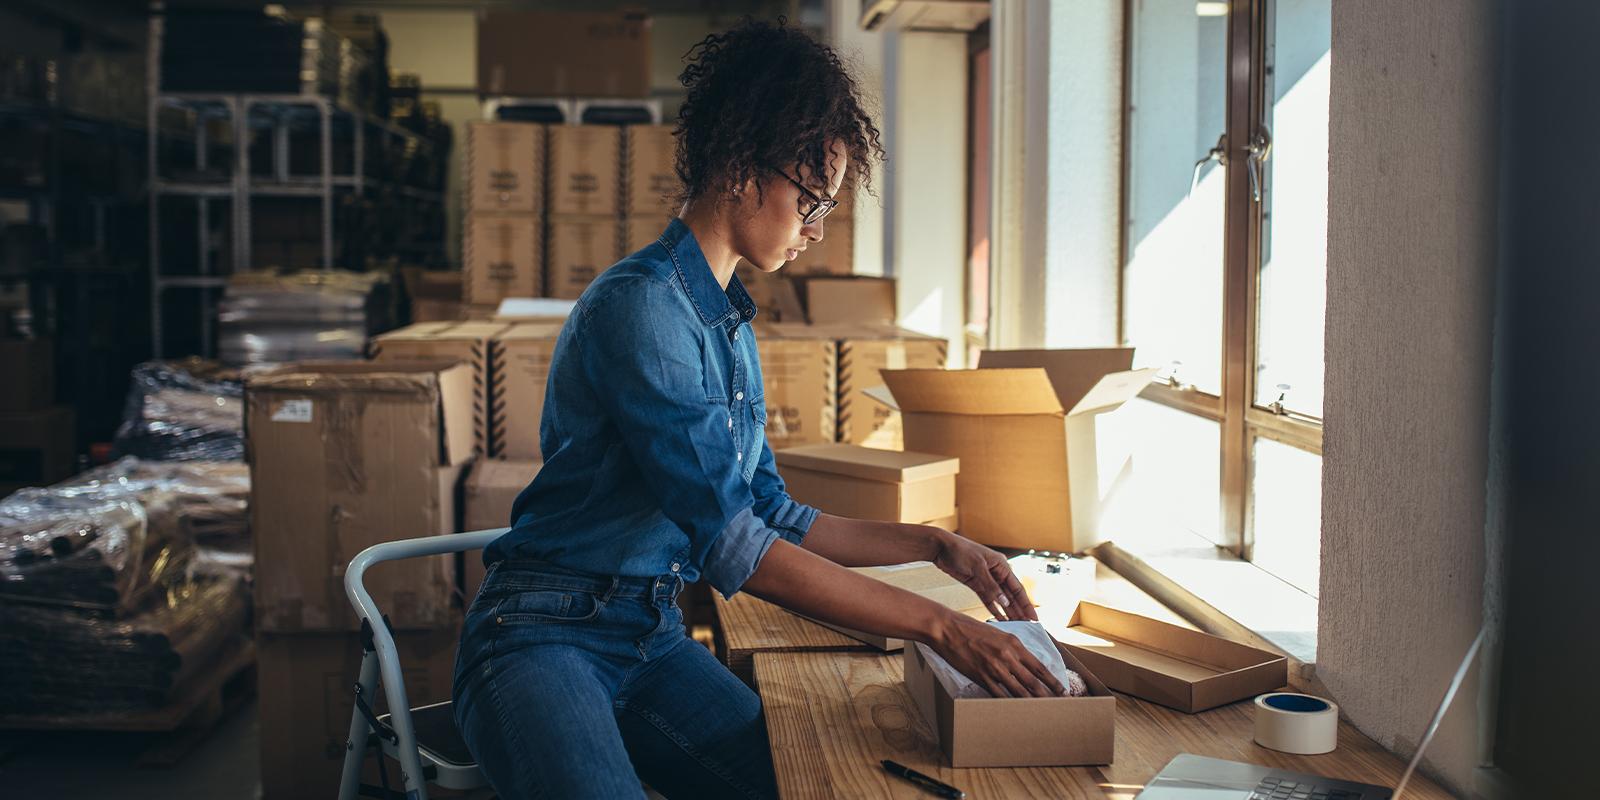 3 Packaging Design Ideas For E-commerce Brands In 2021